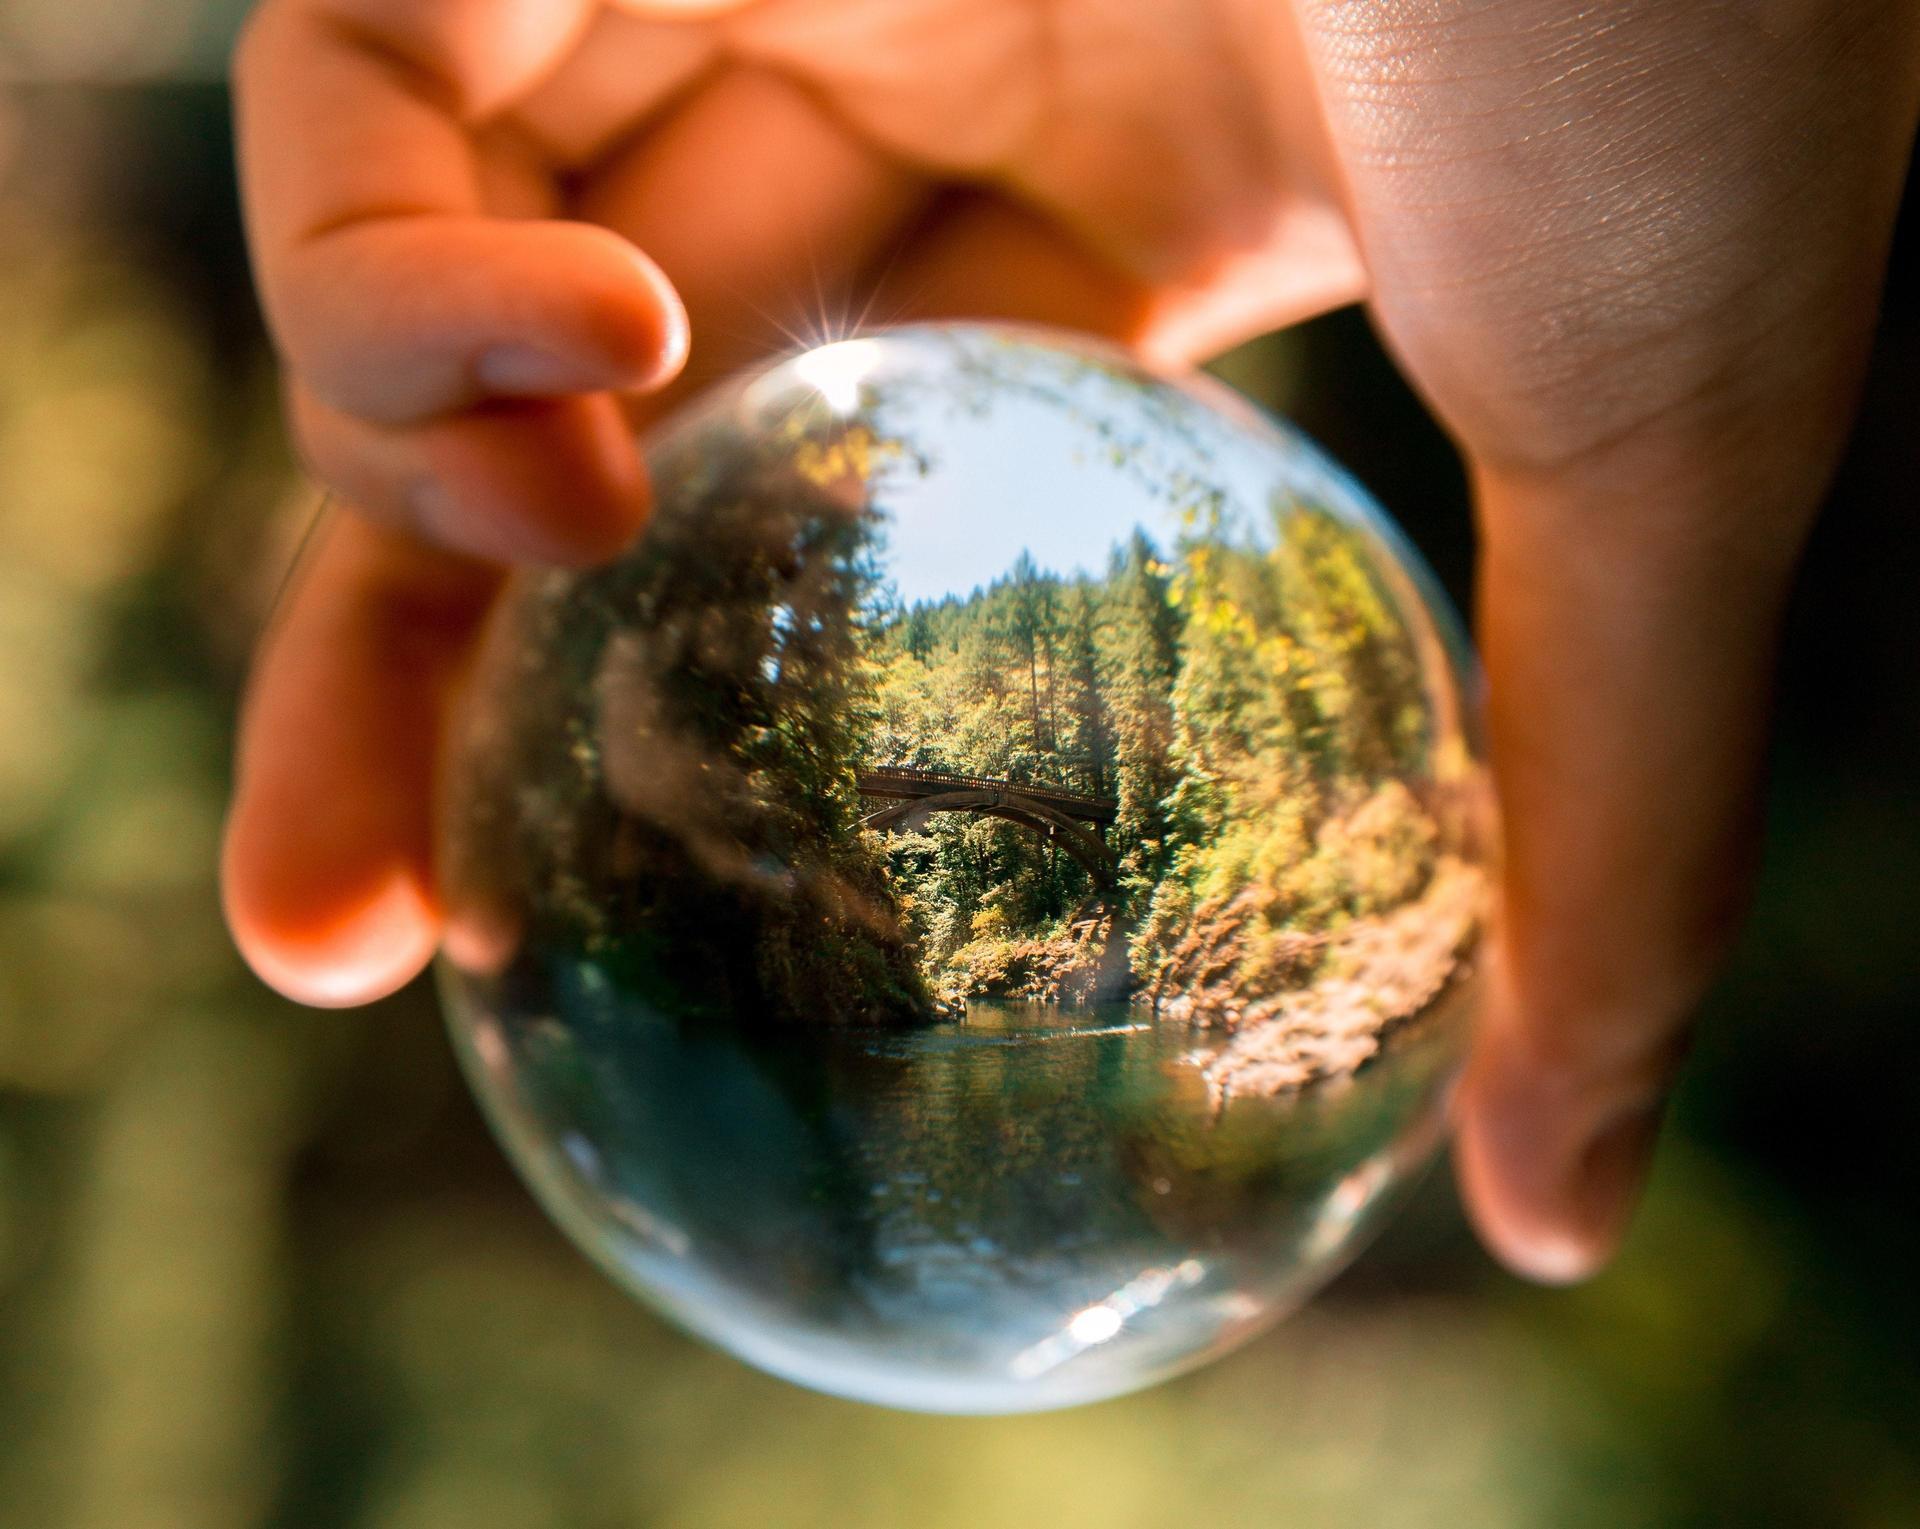 hand and glass ball